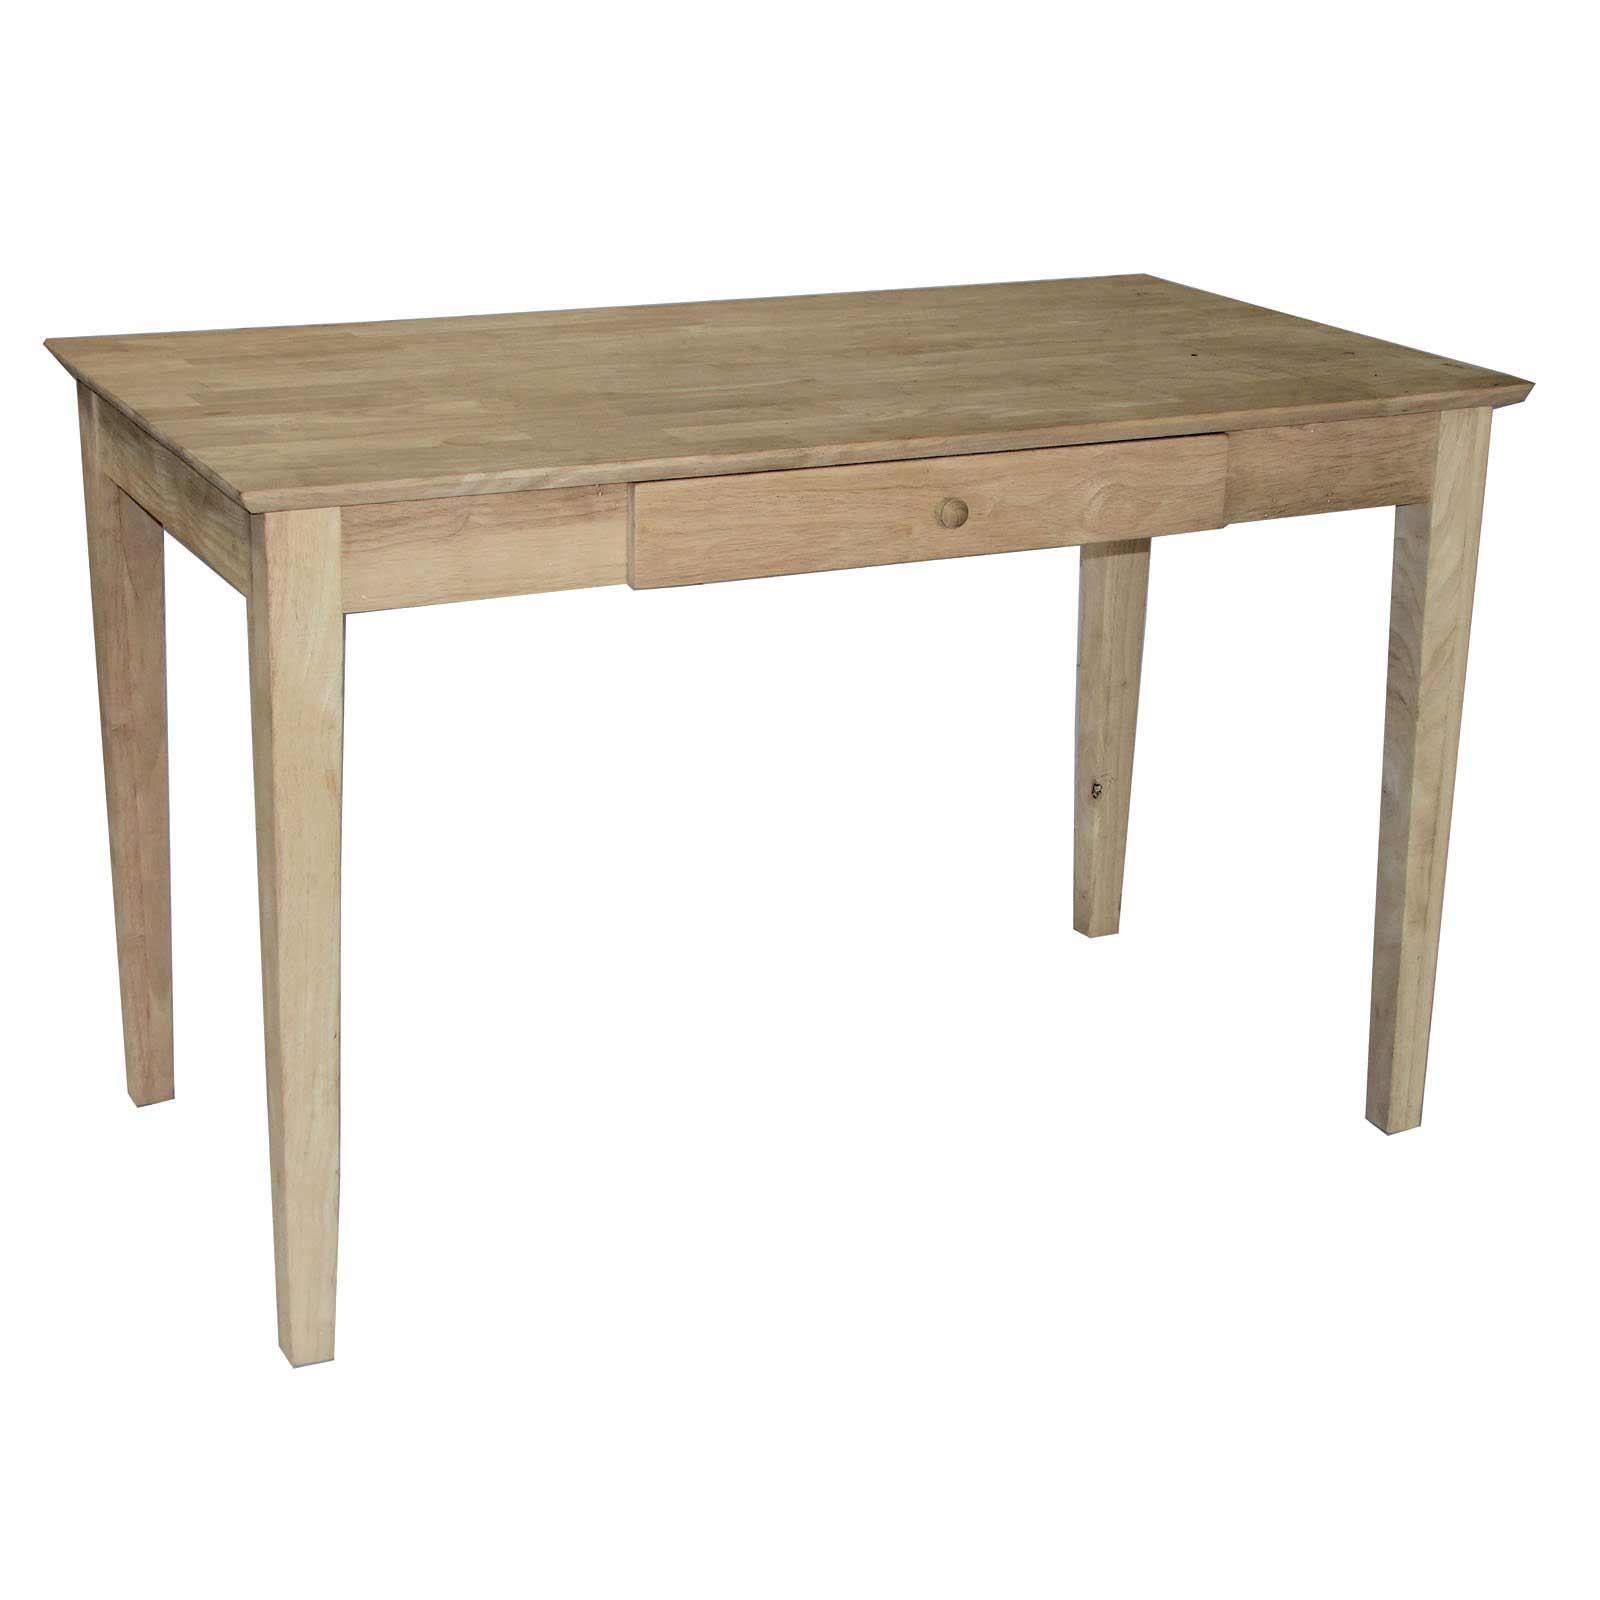 Unfinished Wood Furniture Atlanta Furniture Design Ideas